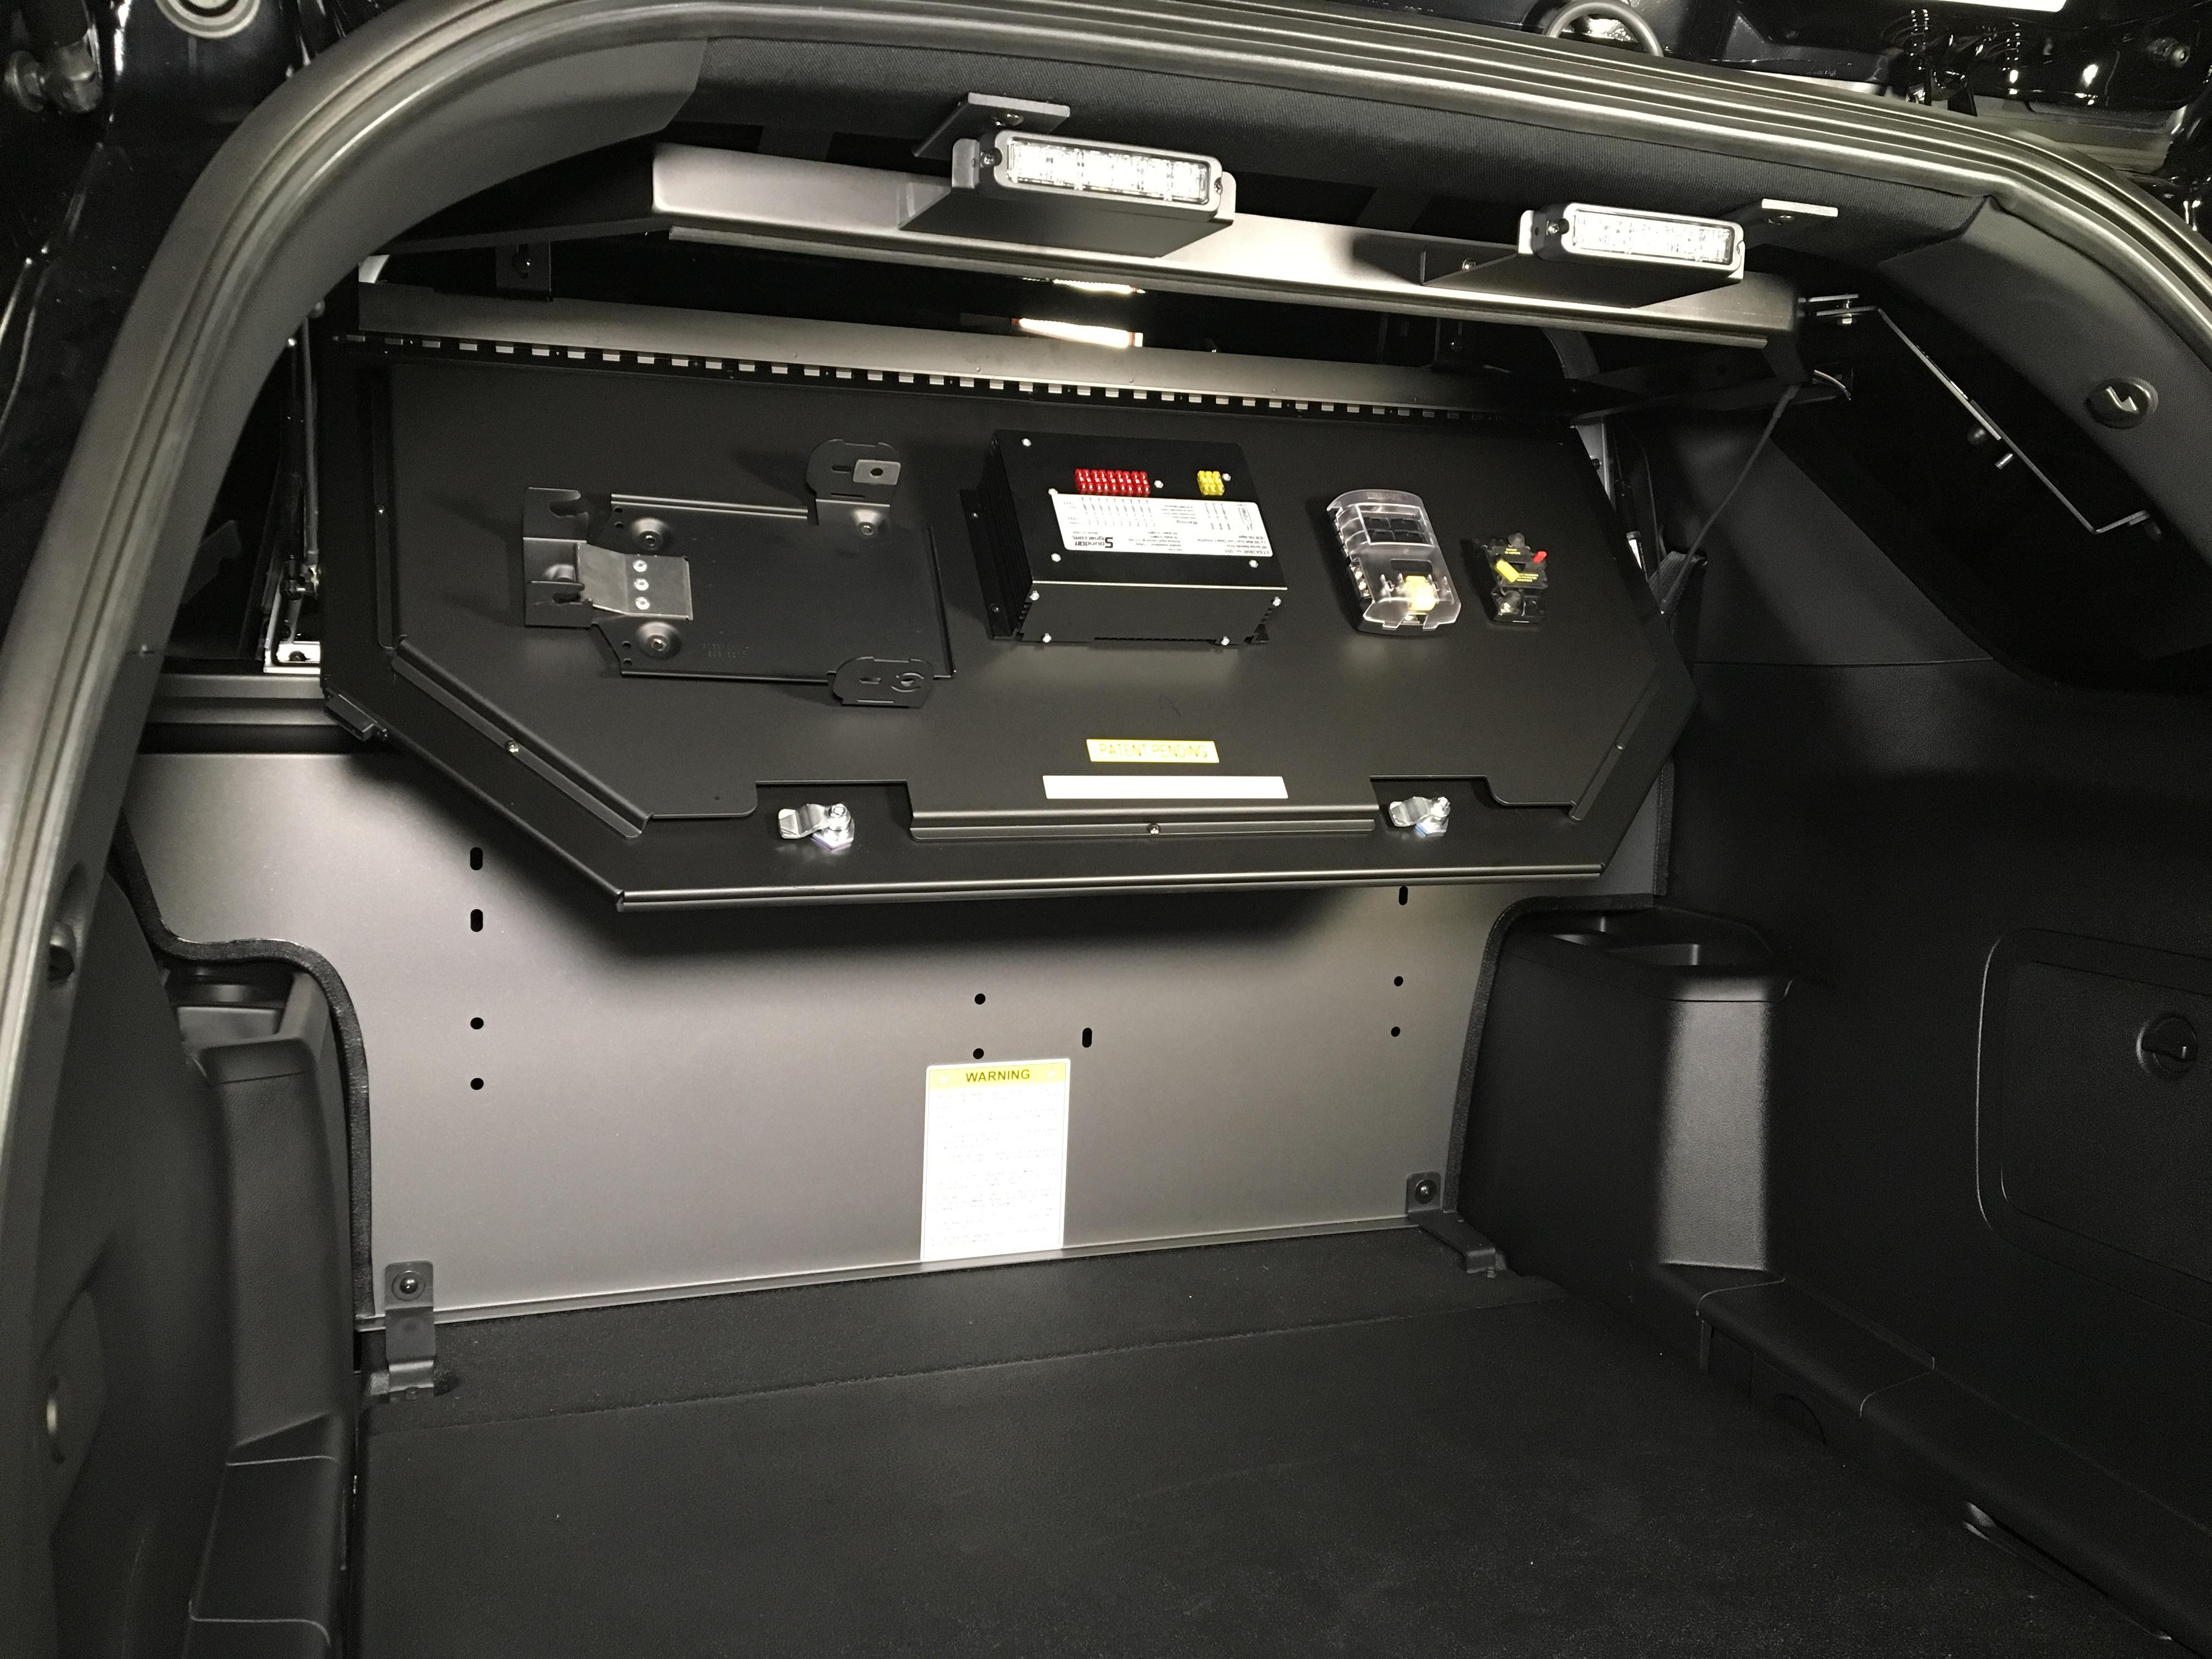 Printer Storage Ideas The Loft Electronics Tray Trunk Storage Products